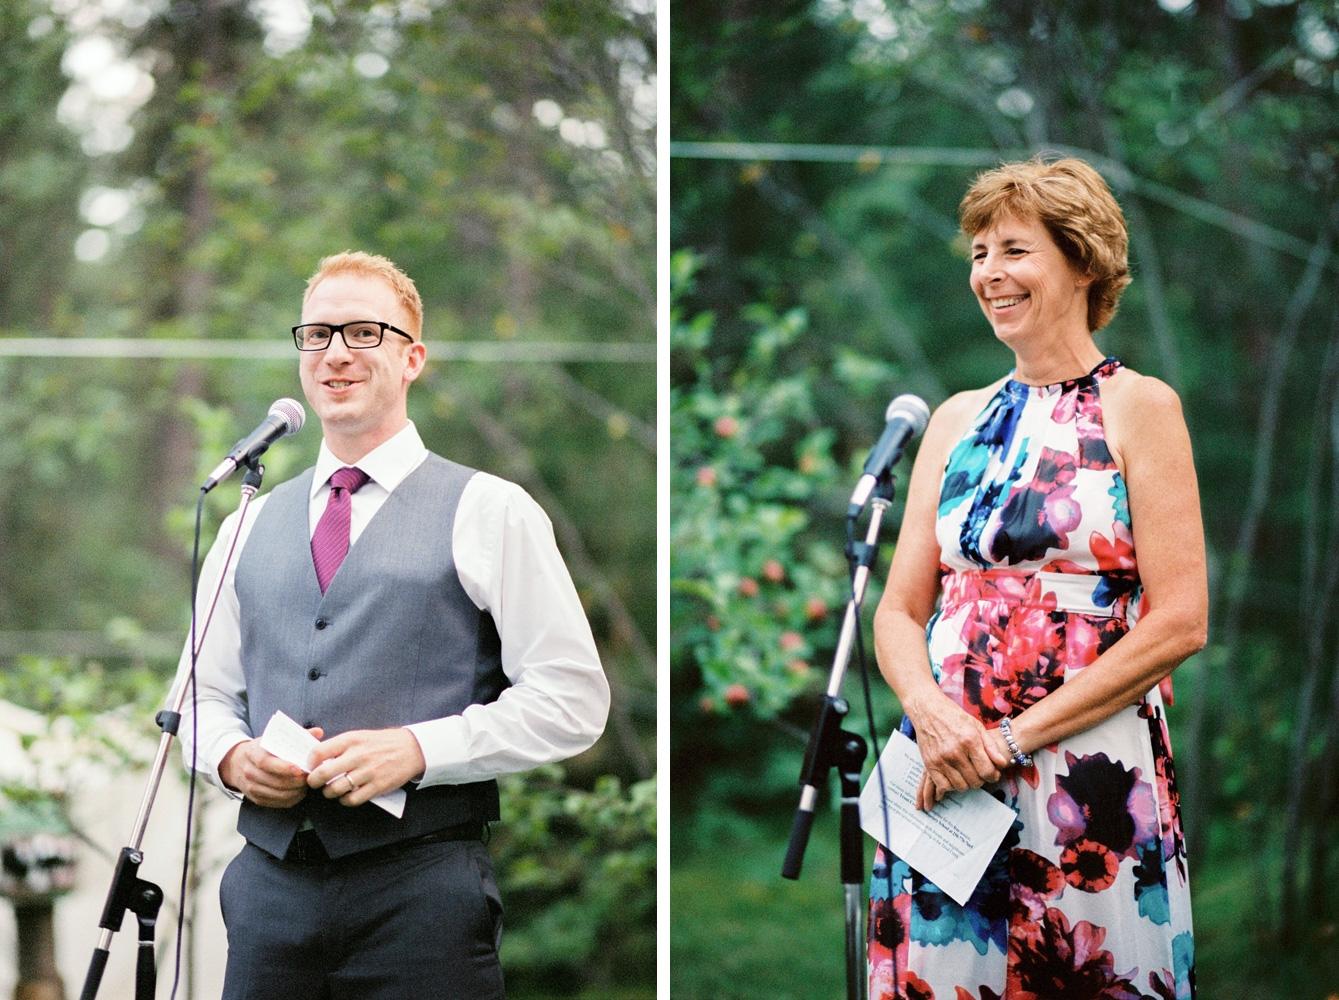 wedding-speeches-at-a-backyard-wedding.jpg